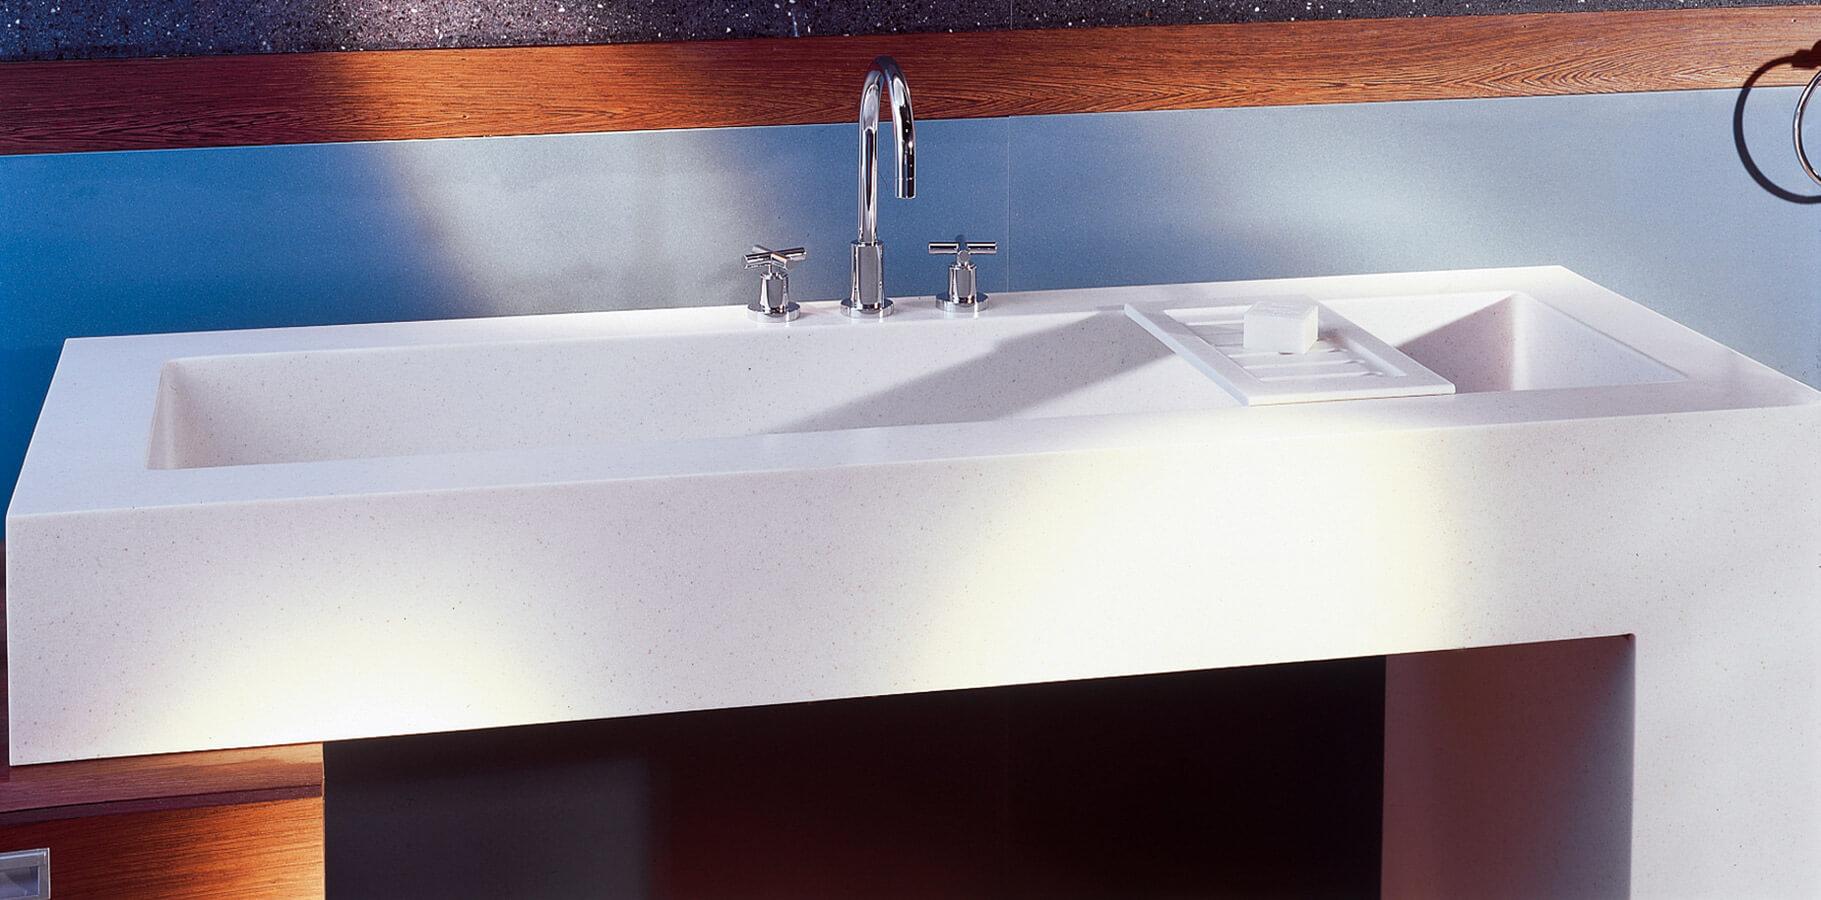 corian badkamer – badkamermeubel op maat | correnti, Badkamer